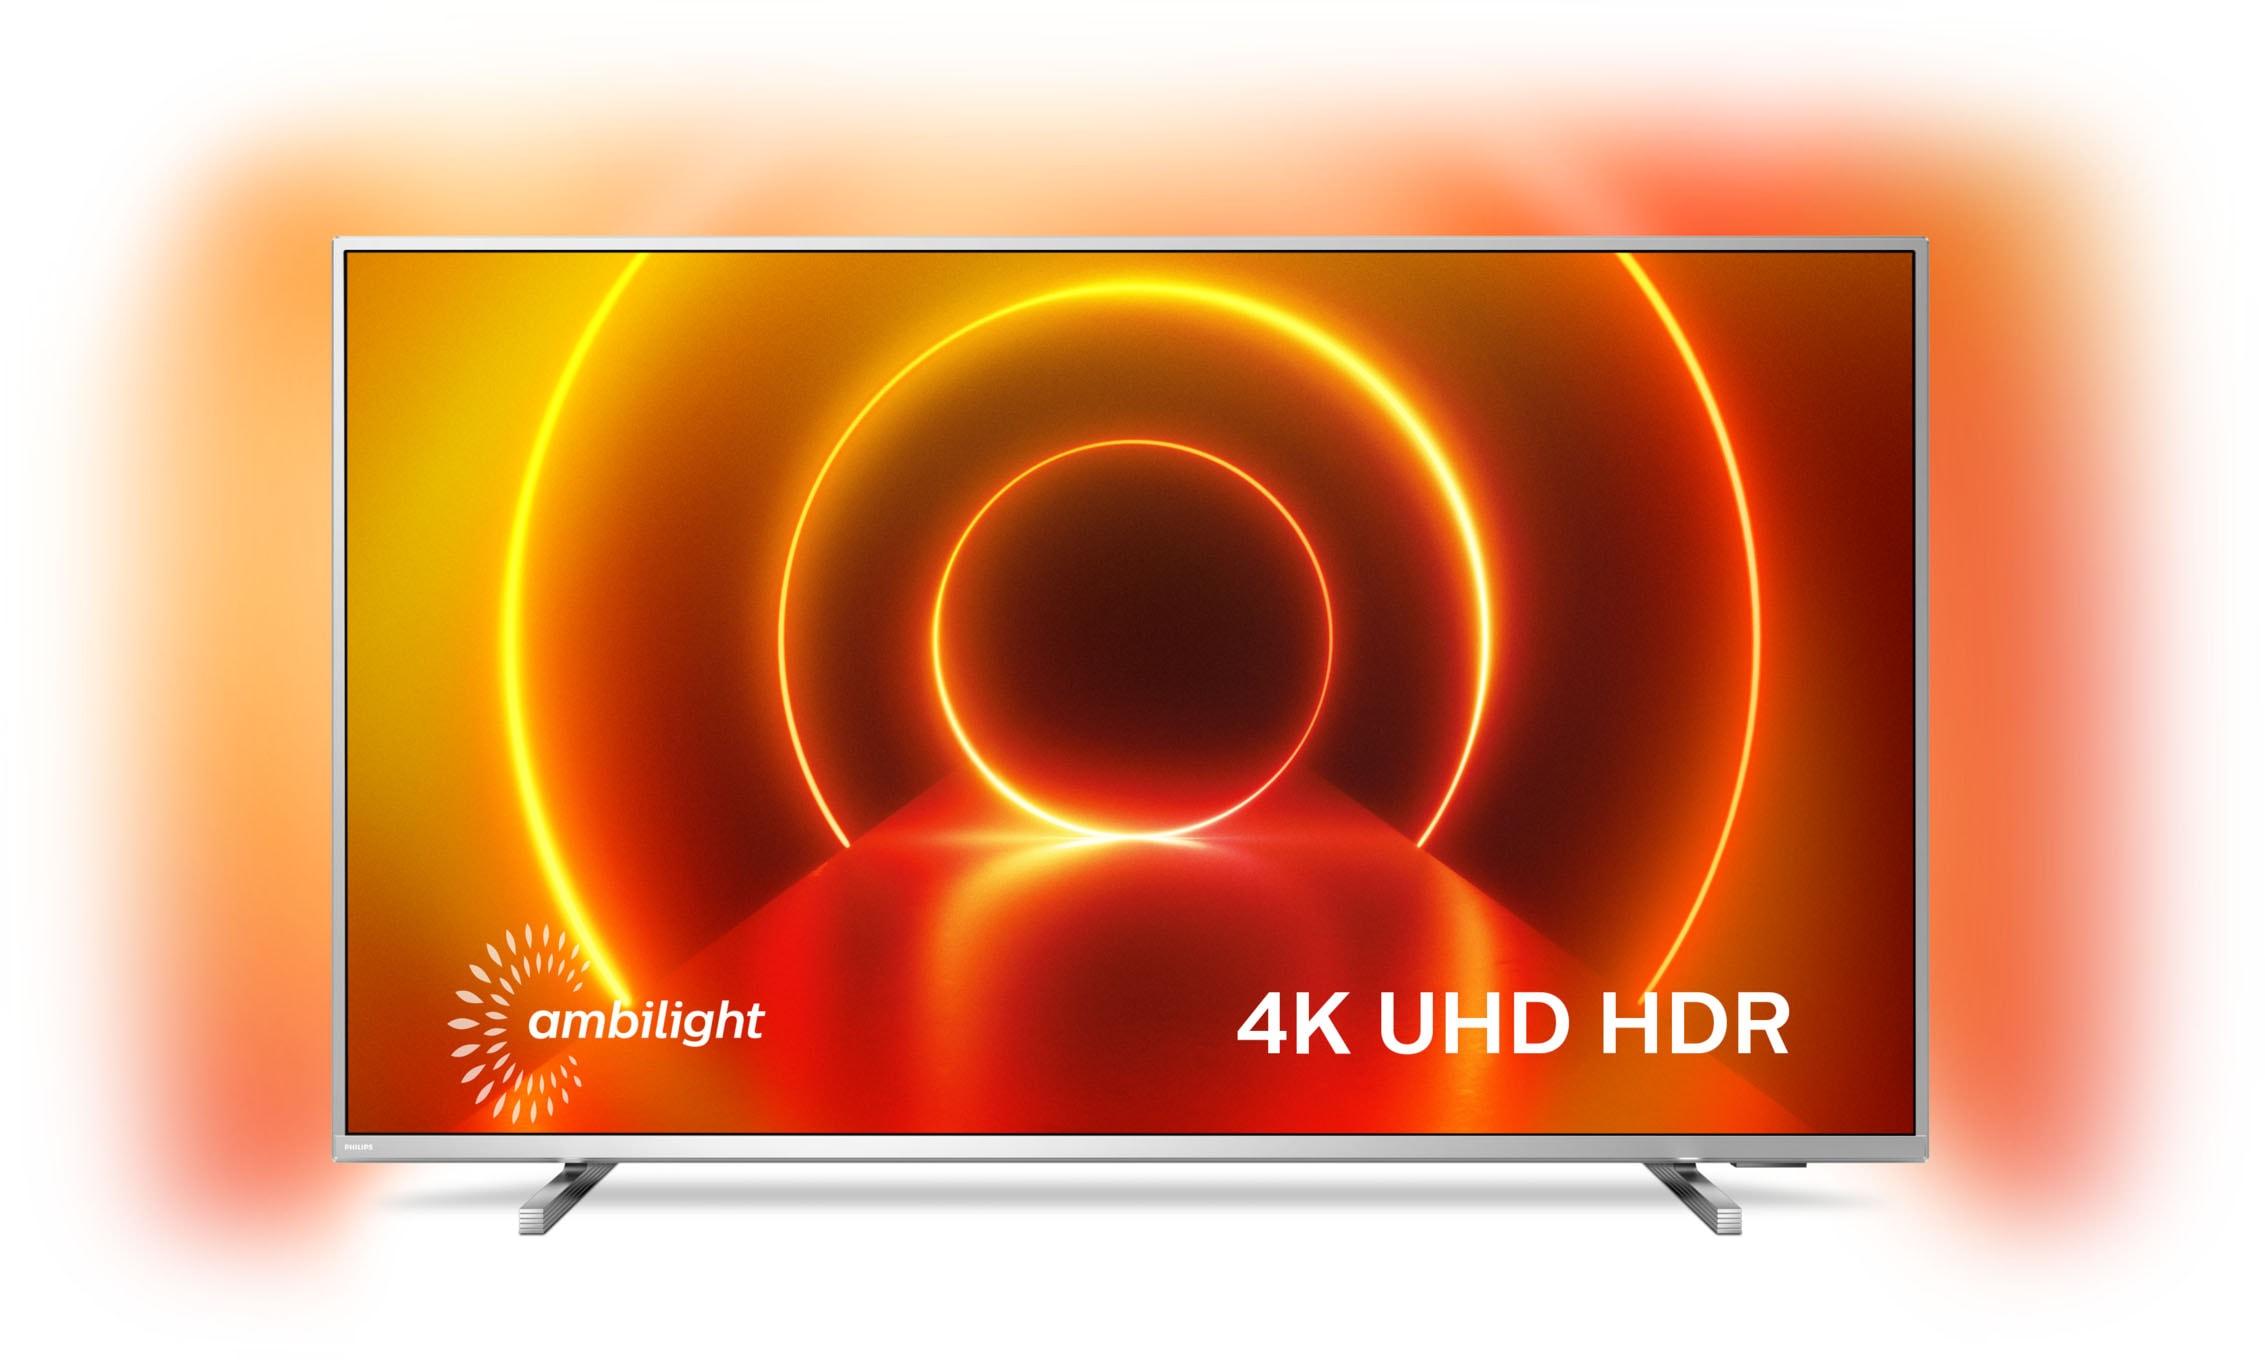 Philips LED-Fernseher 43PUS8105 12 , 108 cm 43 , 4K Ultra HD, Smart-TV, 3-seitiges Ambilght